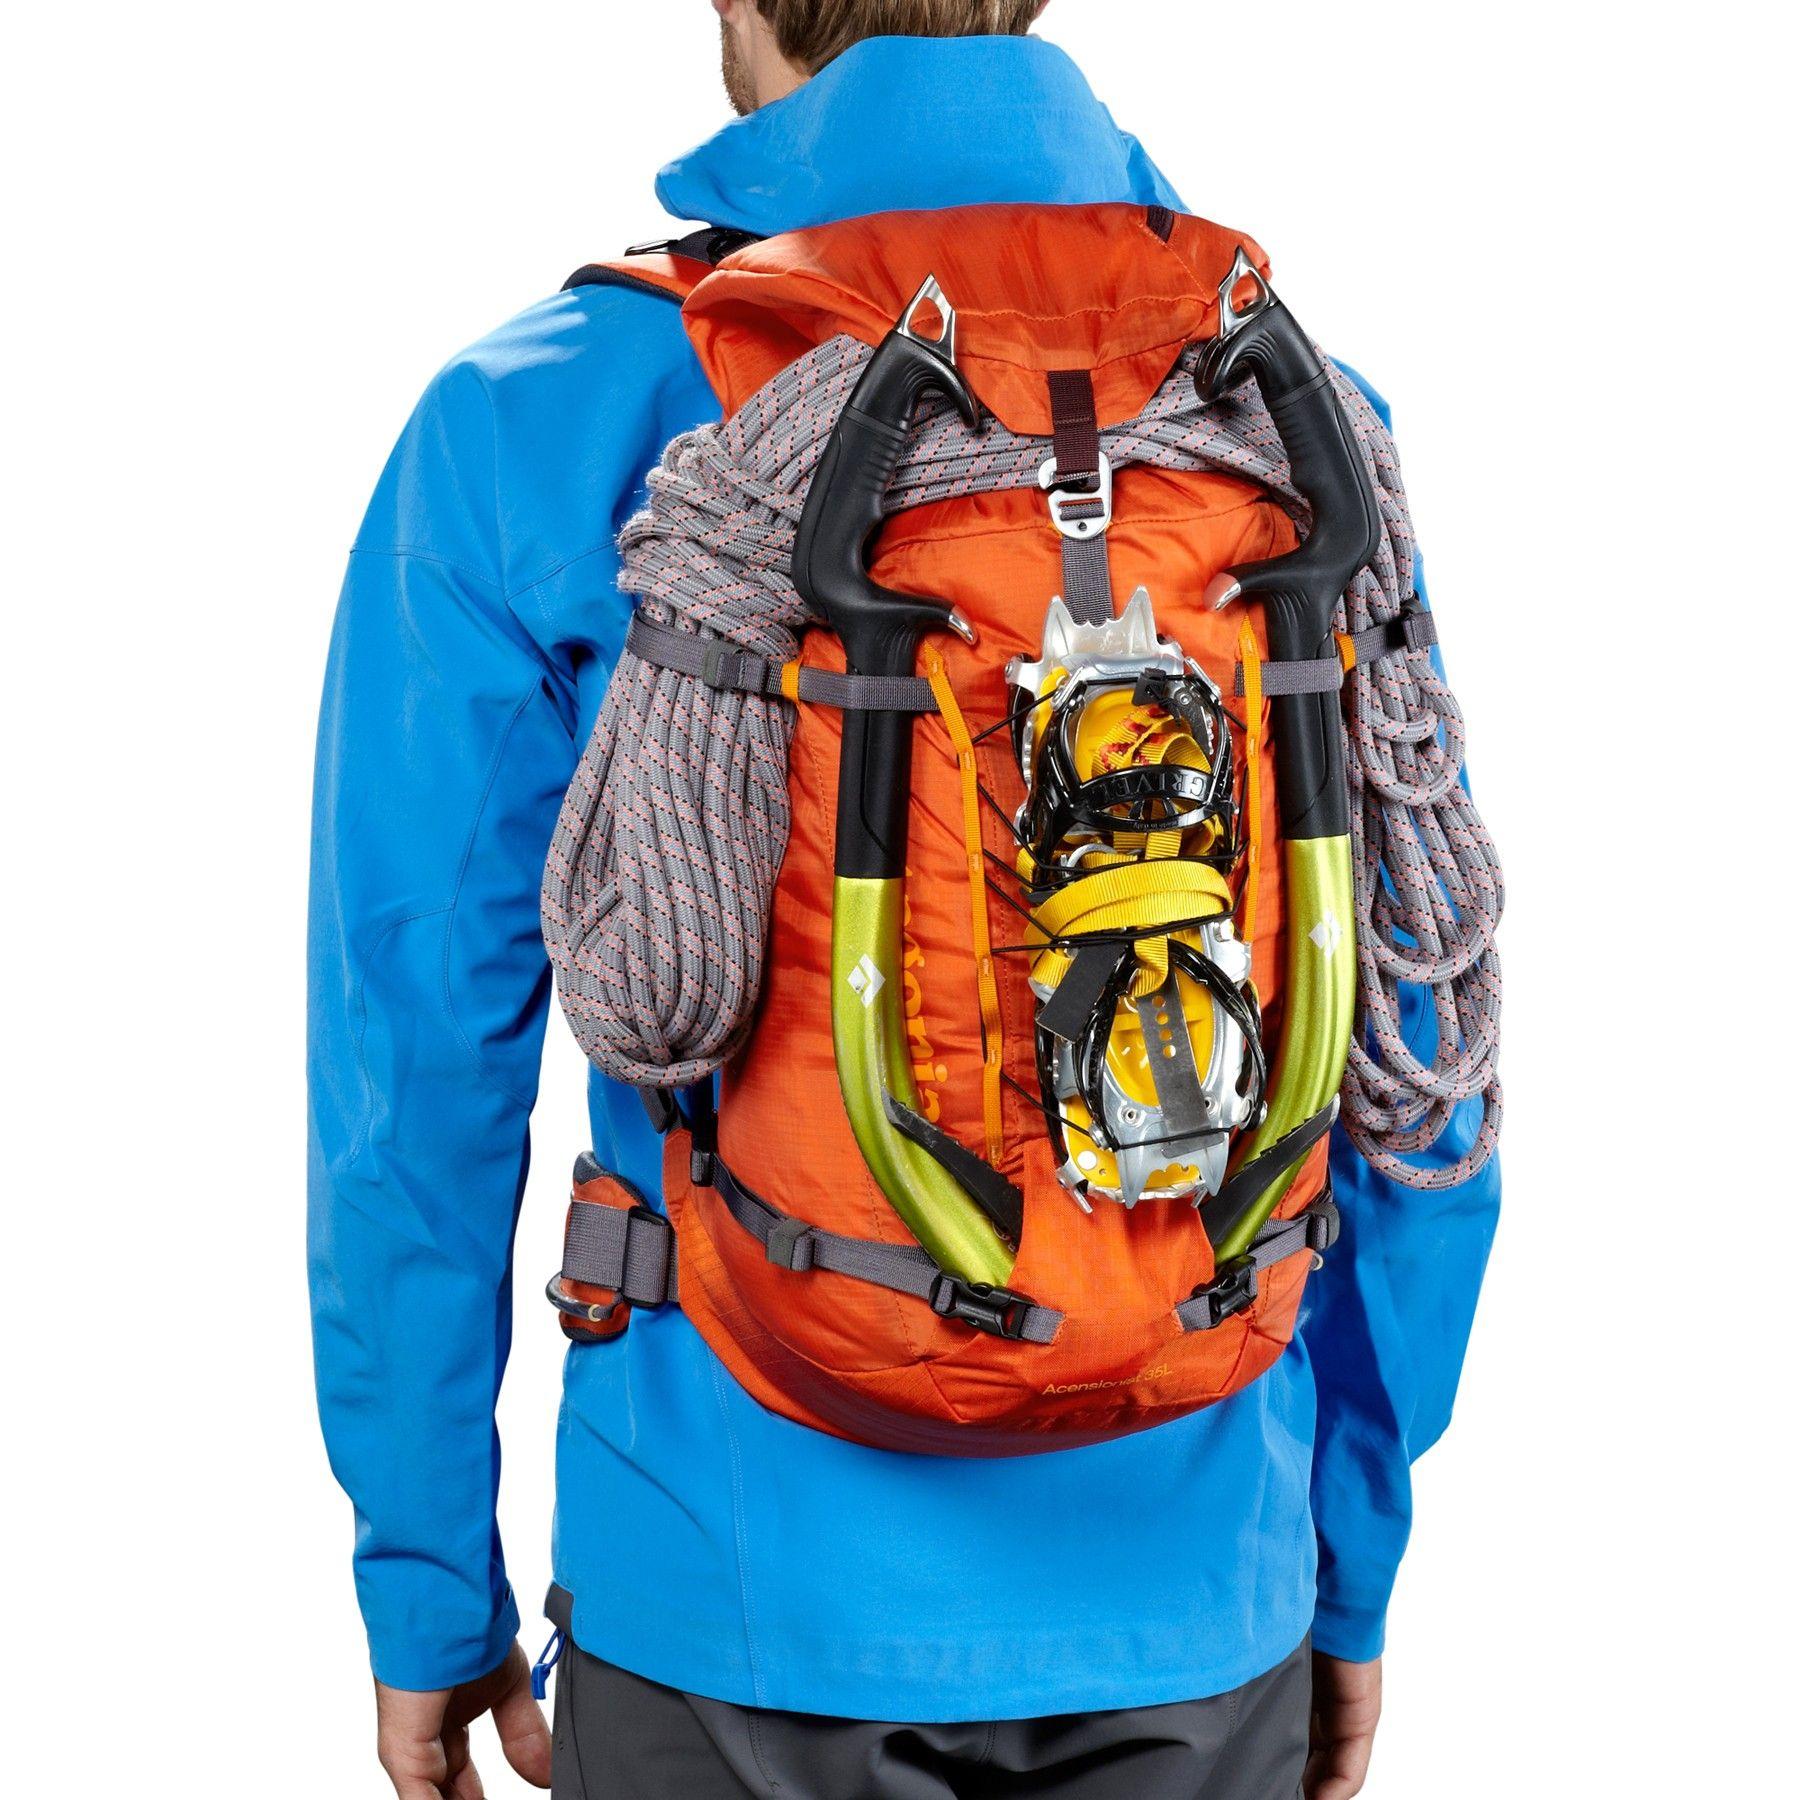 #Ascensionist Packs von #Patagonia: www.hikeandbike.de